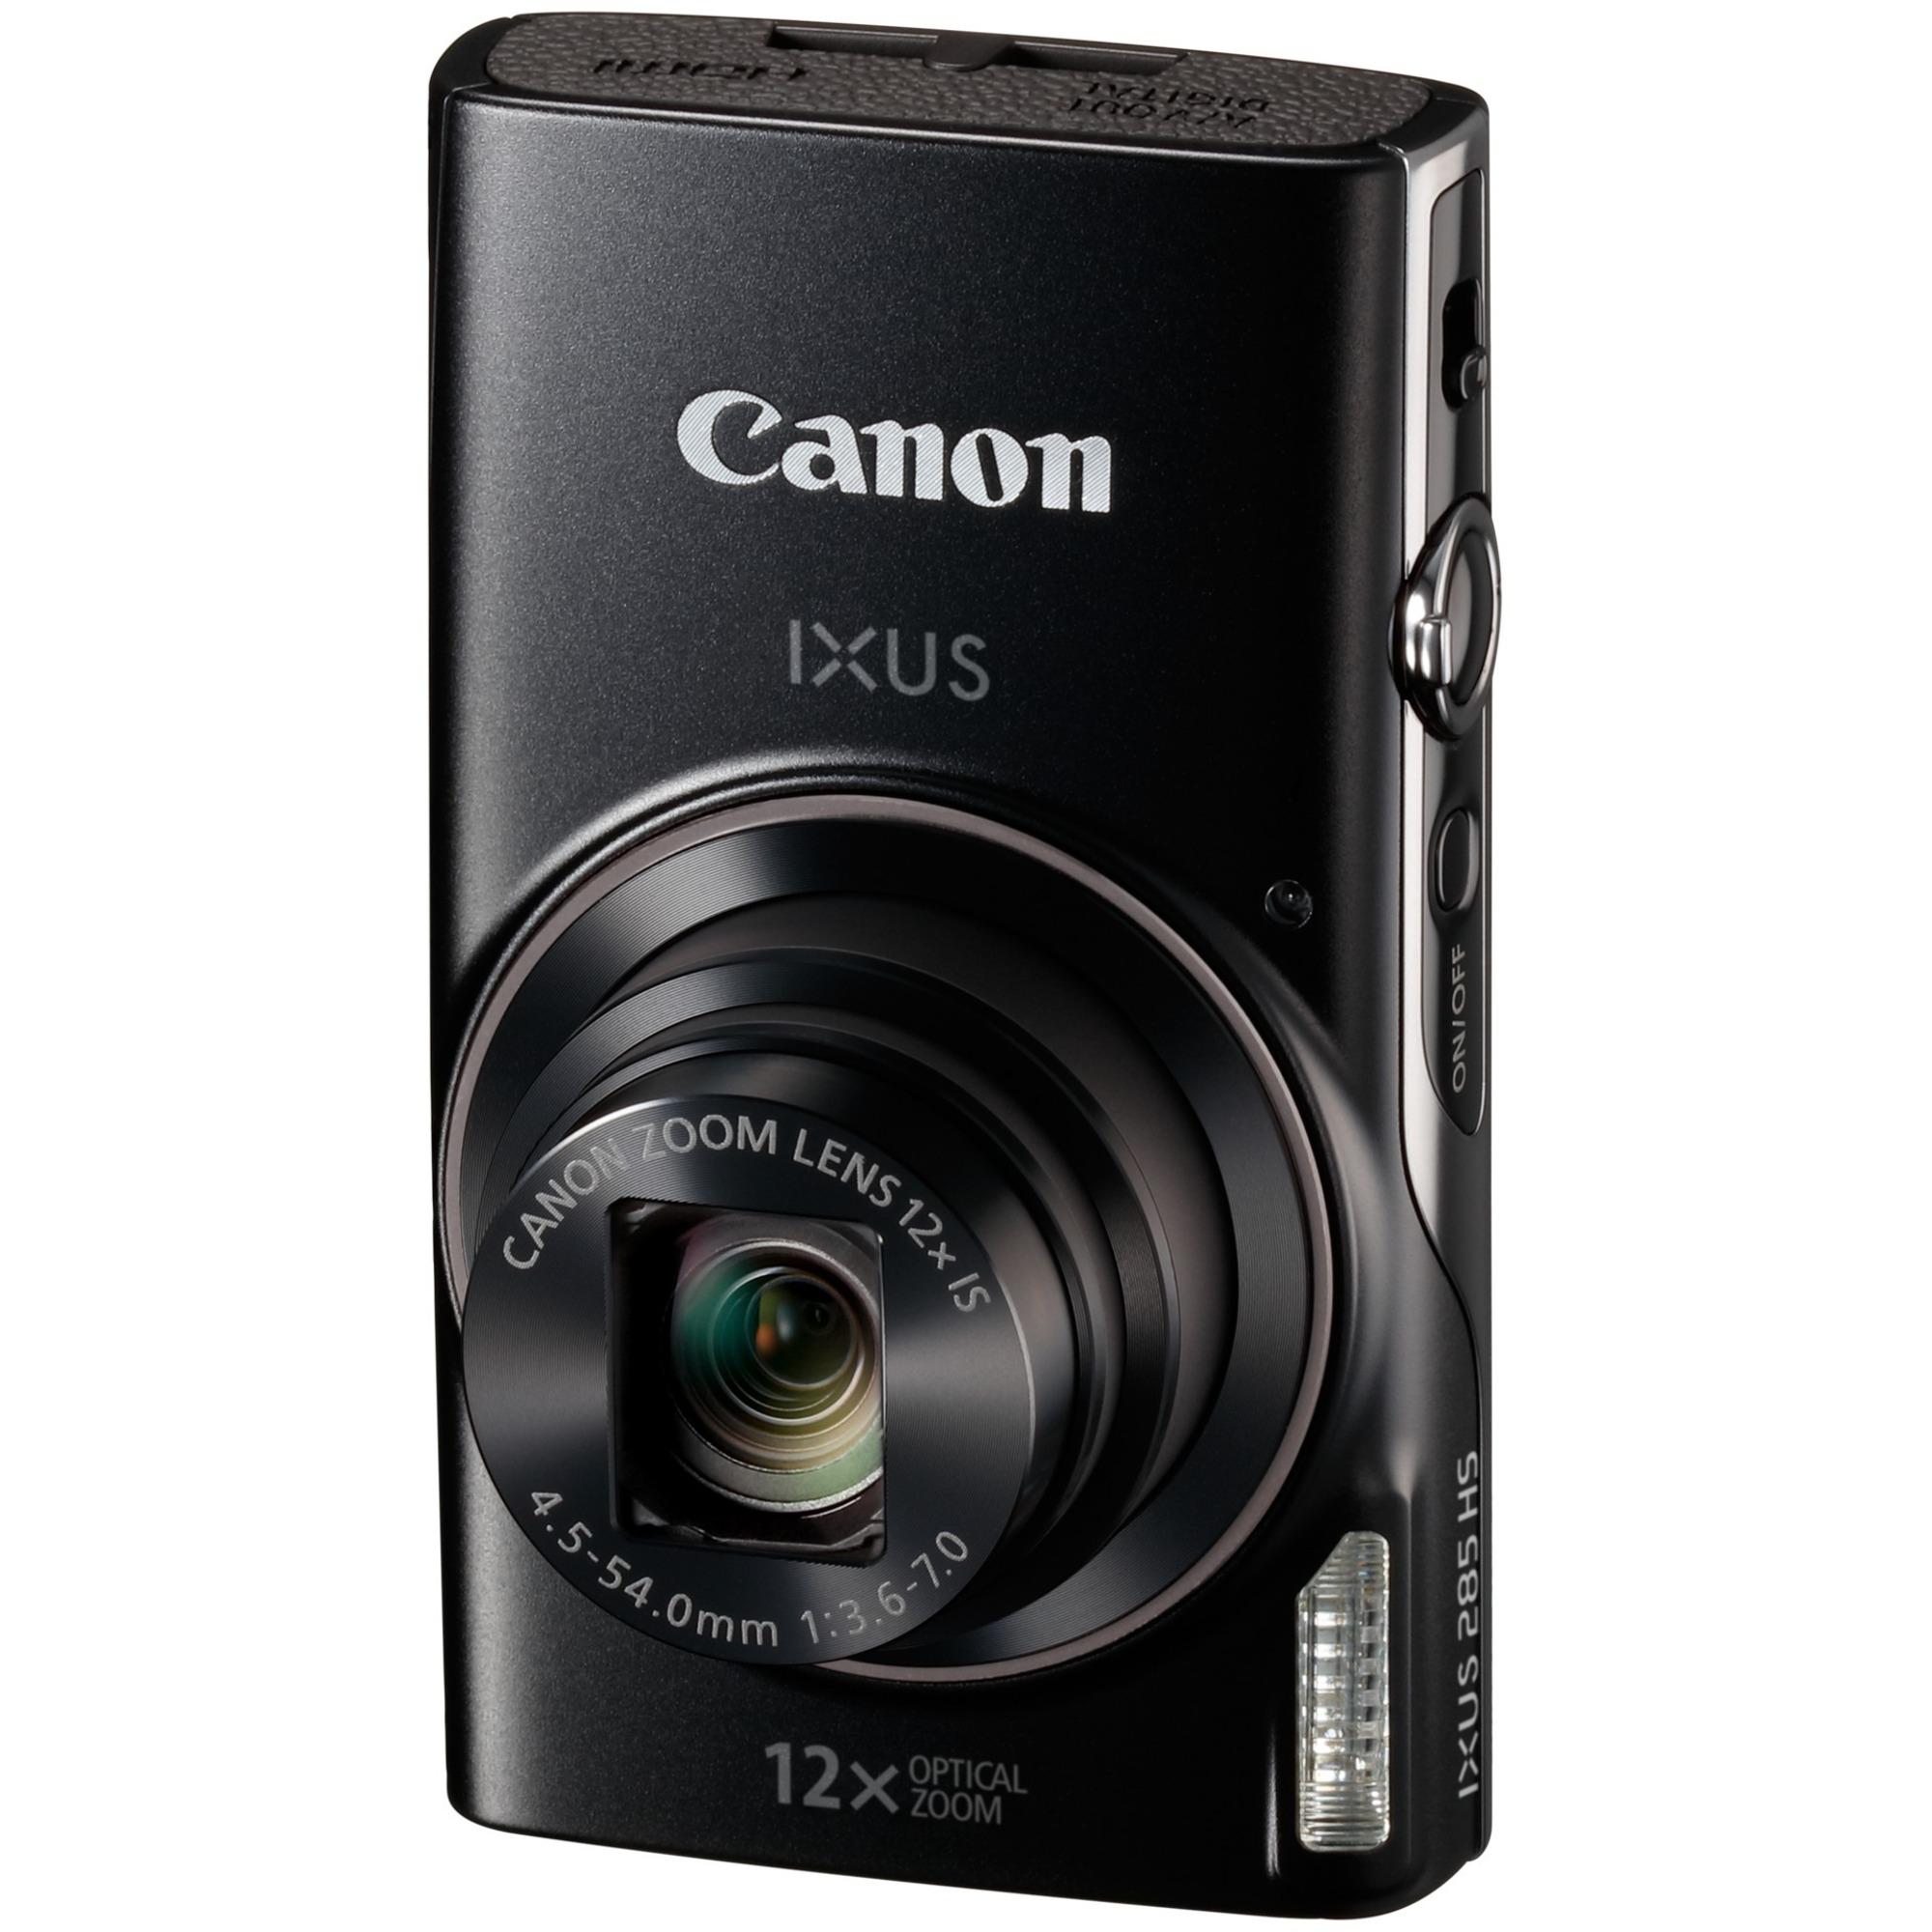 Canon IXUS 285 HS 20.2 Megapixel Compact Camera - Black